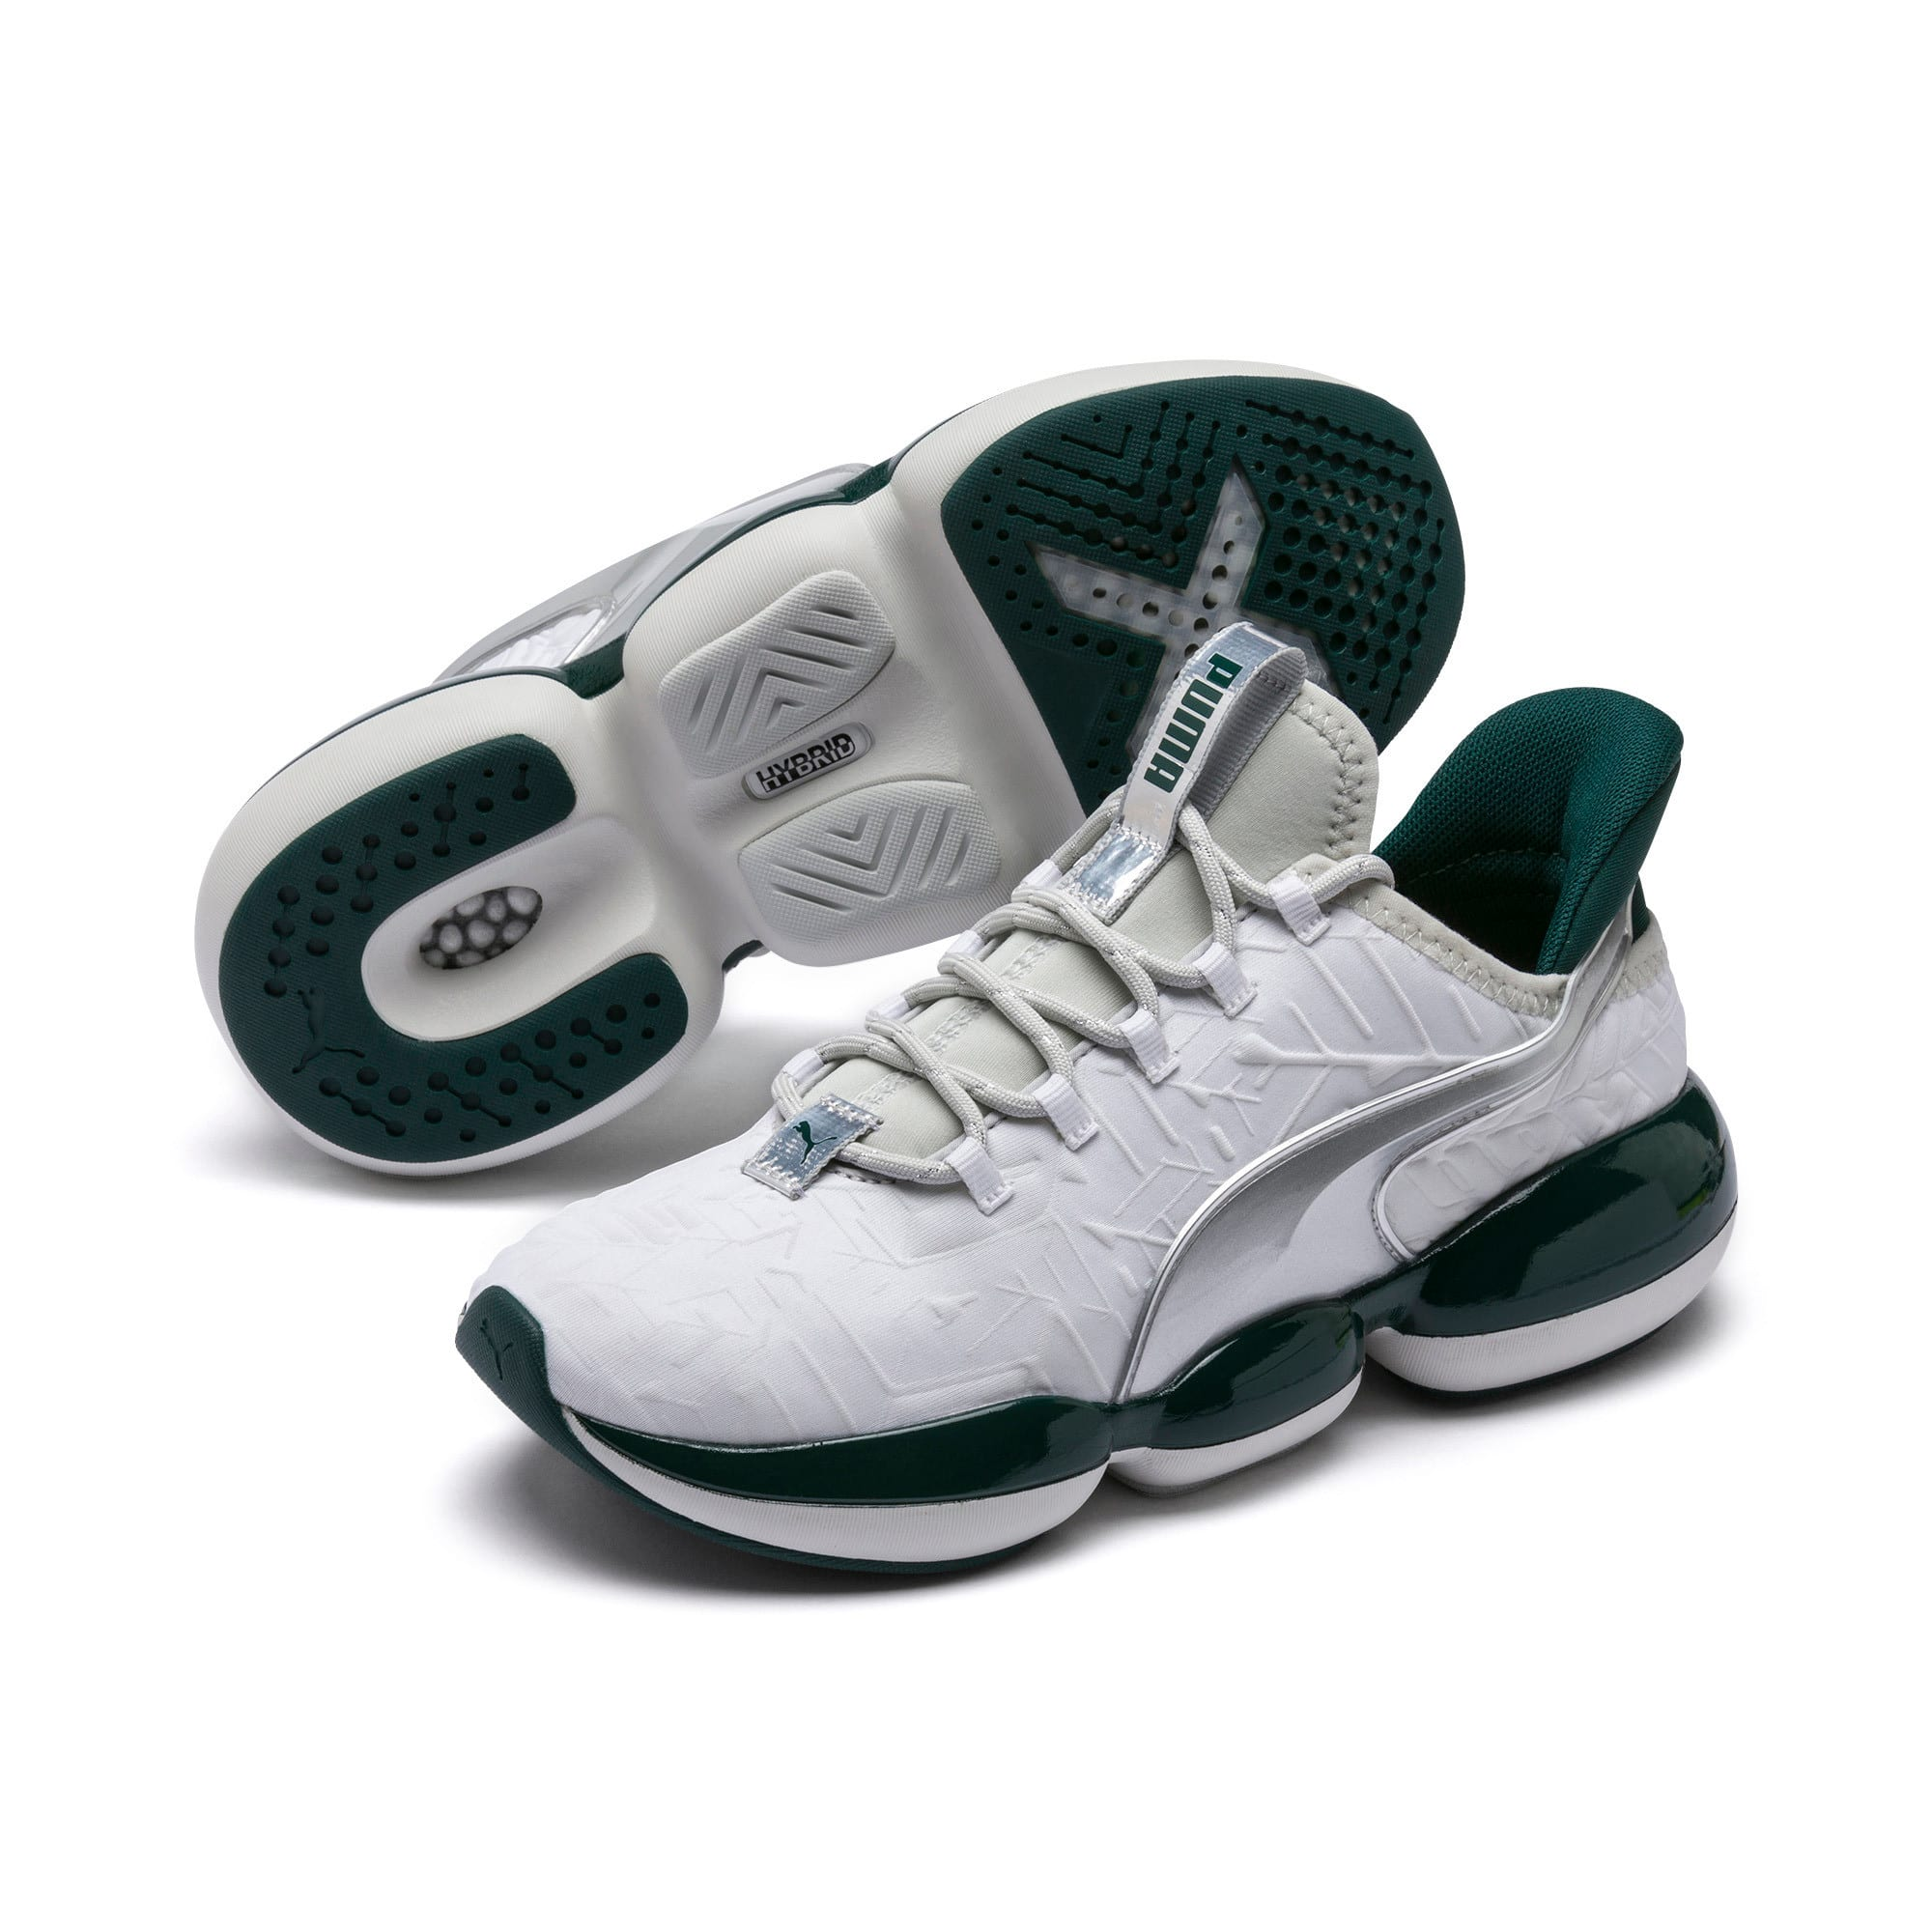 Miniatura 3 de Zapatos deentrenamiento Mode XT Trailblazer para mujer, Puma White-Ponderosa Pine, mediano